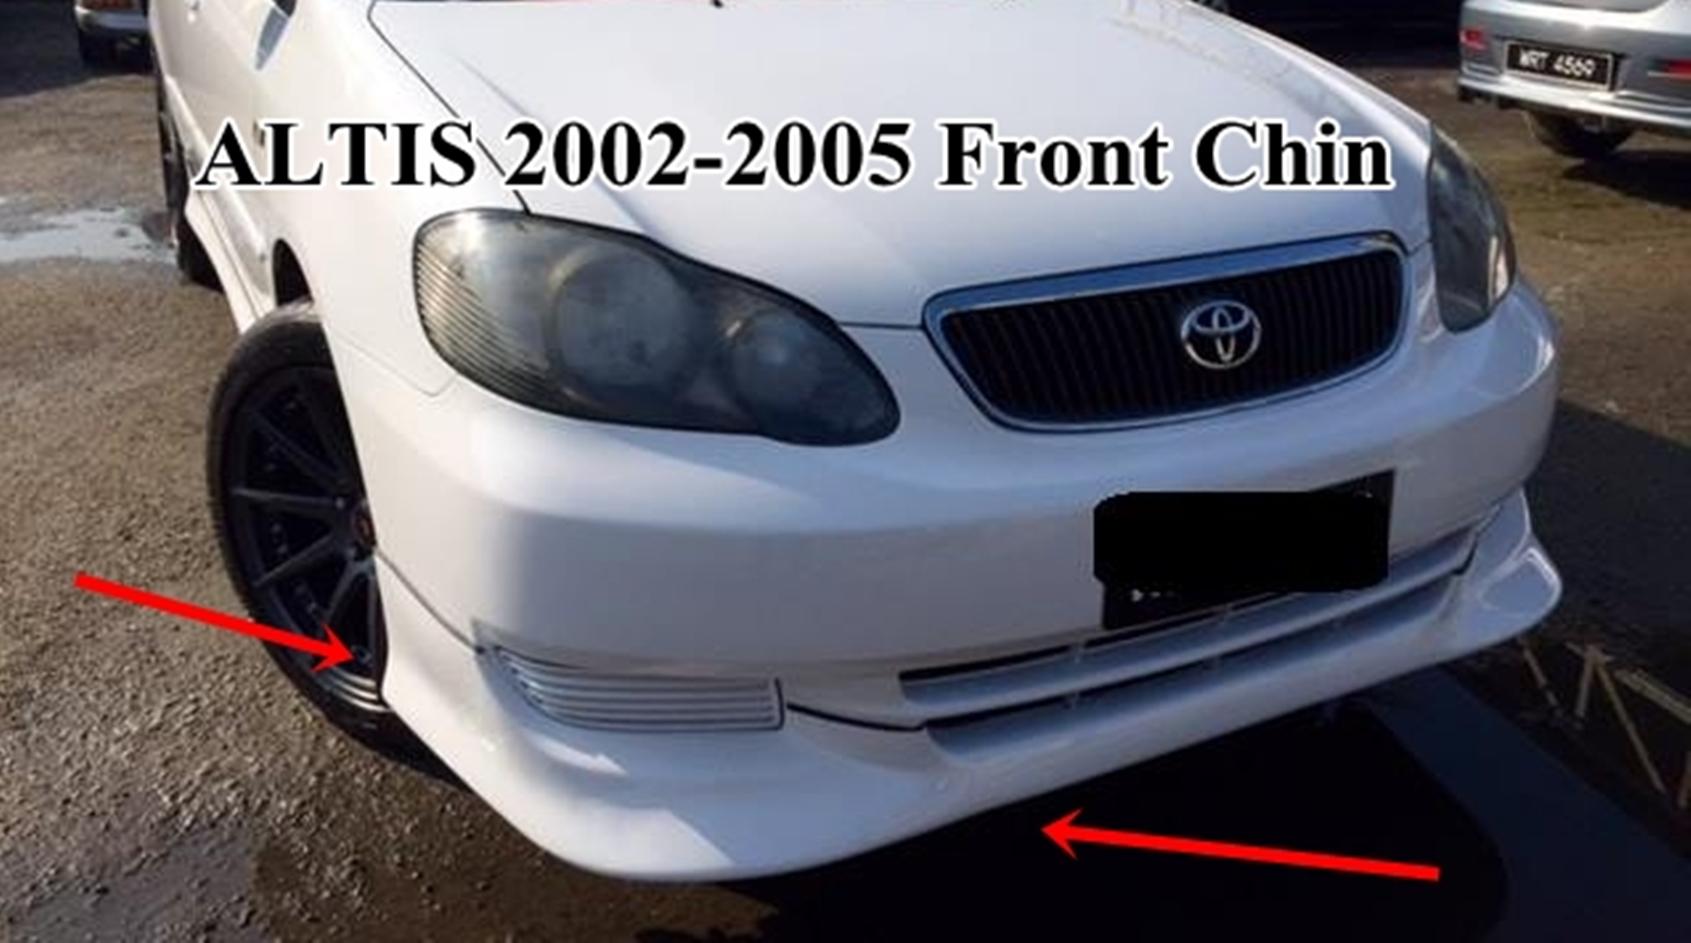 Kelebihan Altis 2002 Harga